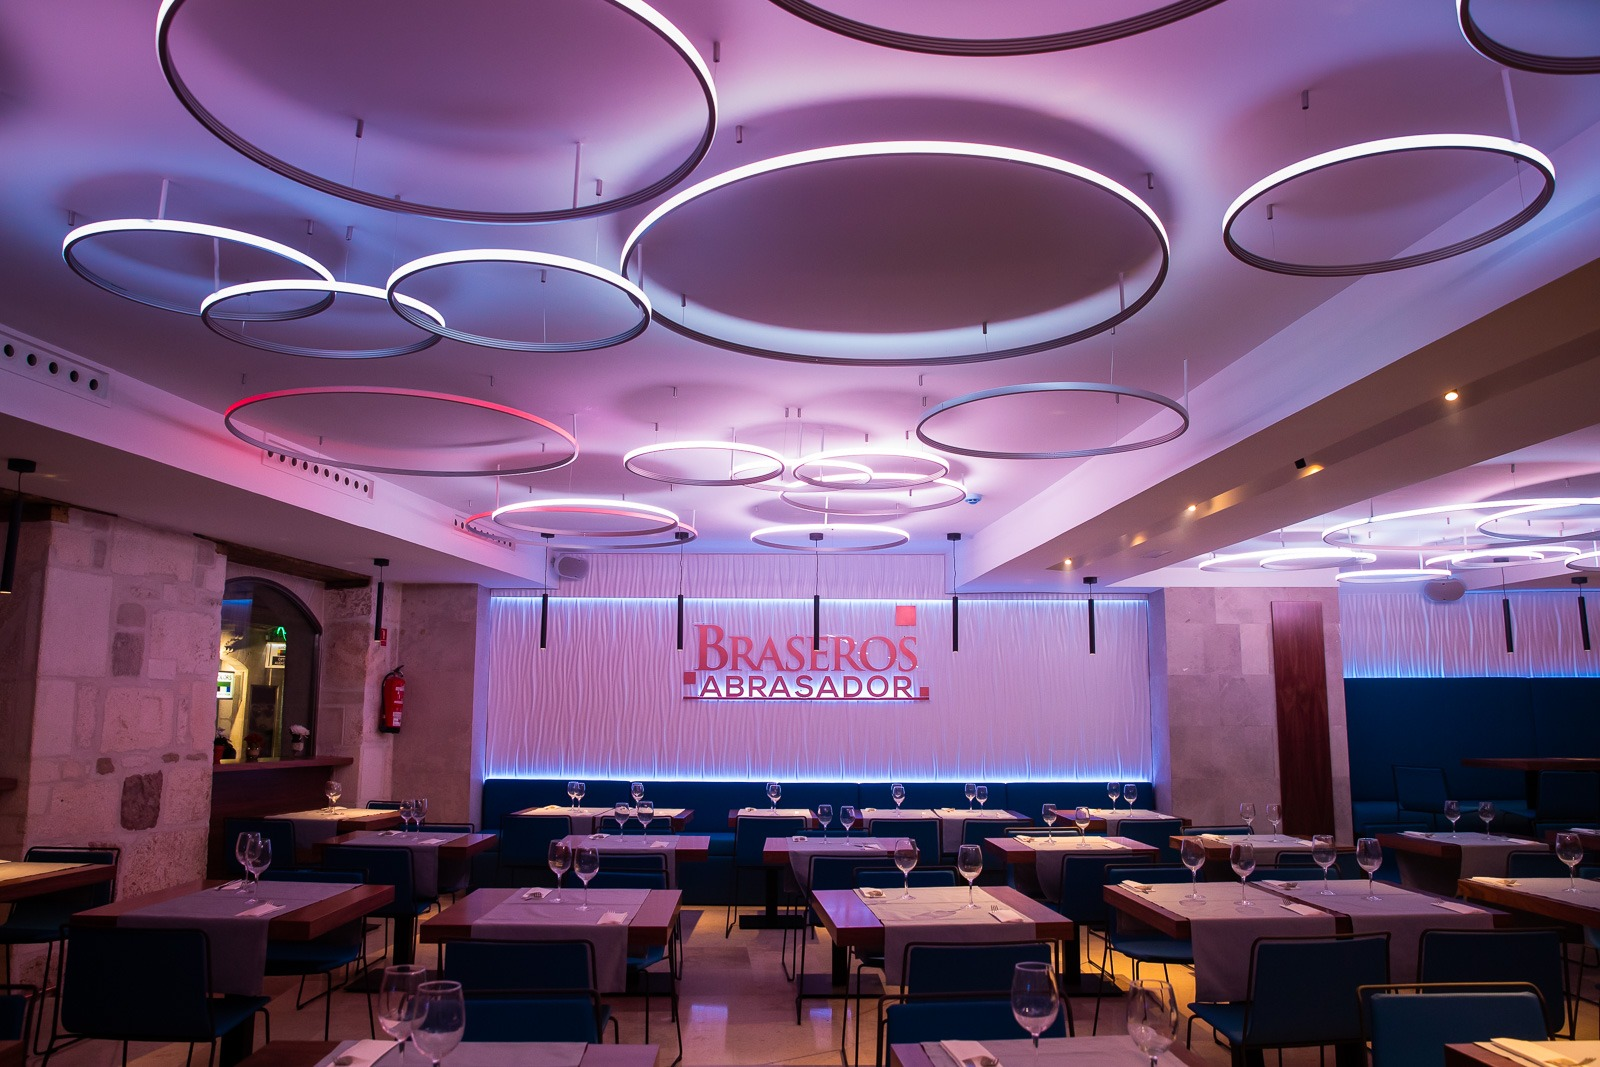 Salon iluminado de Braseros Centroq